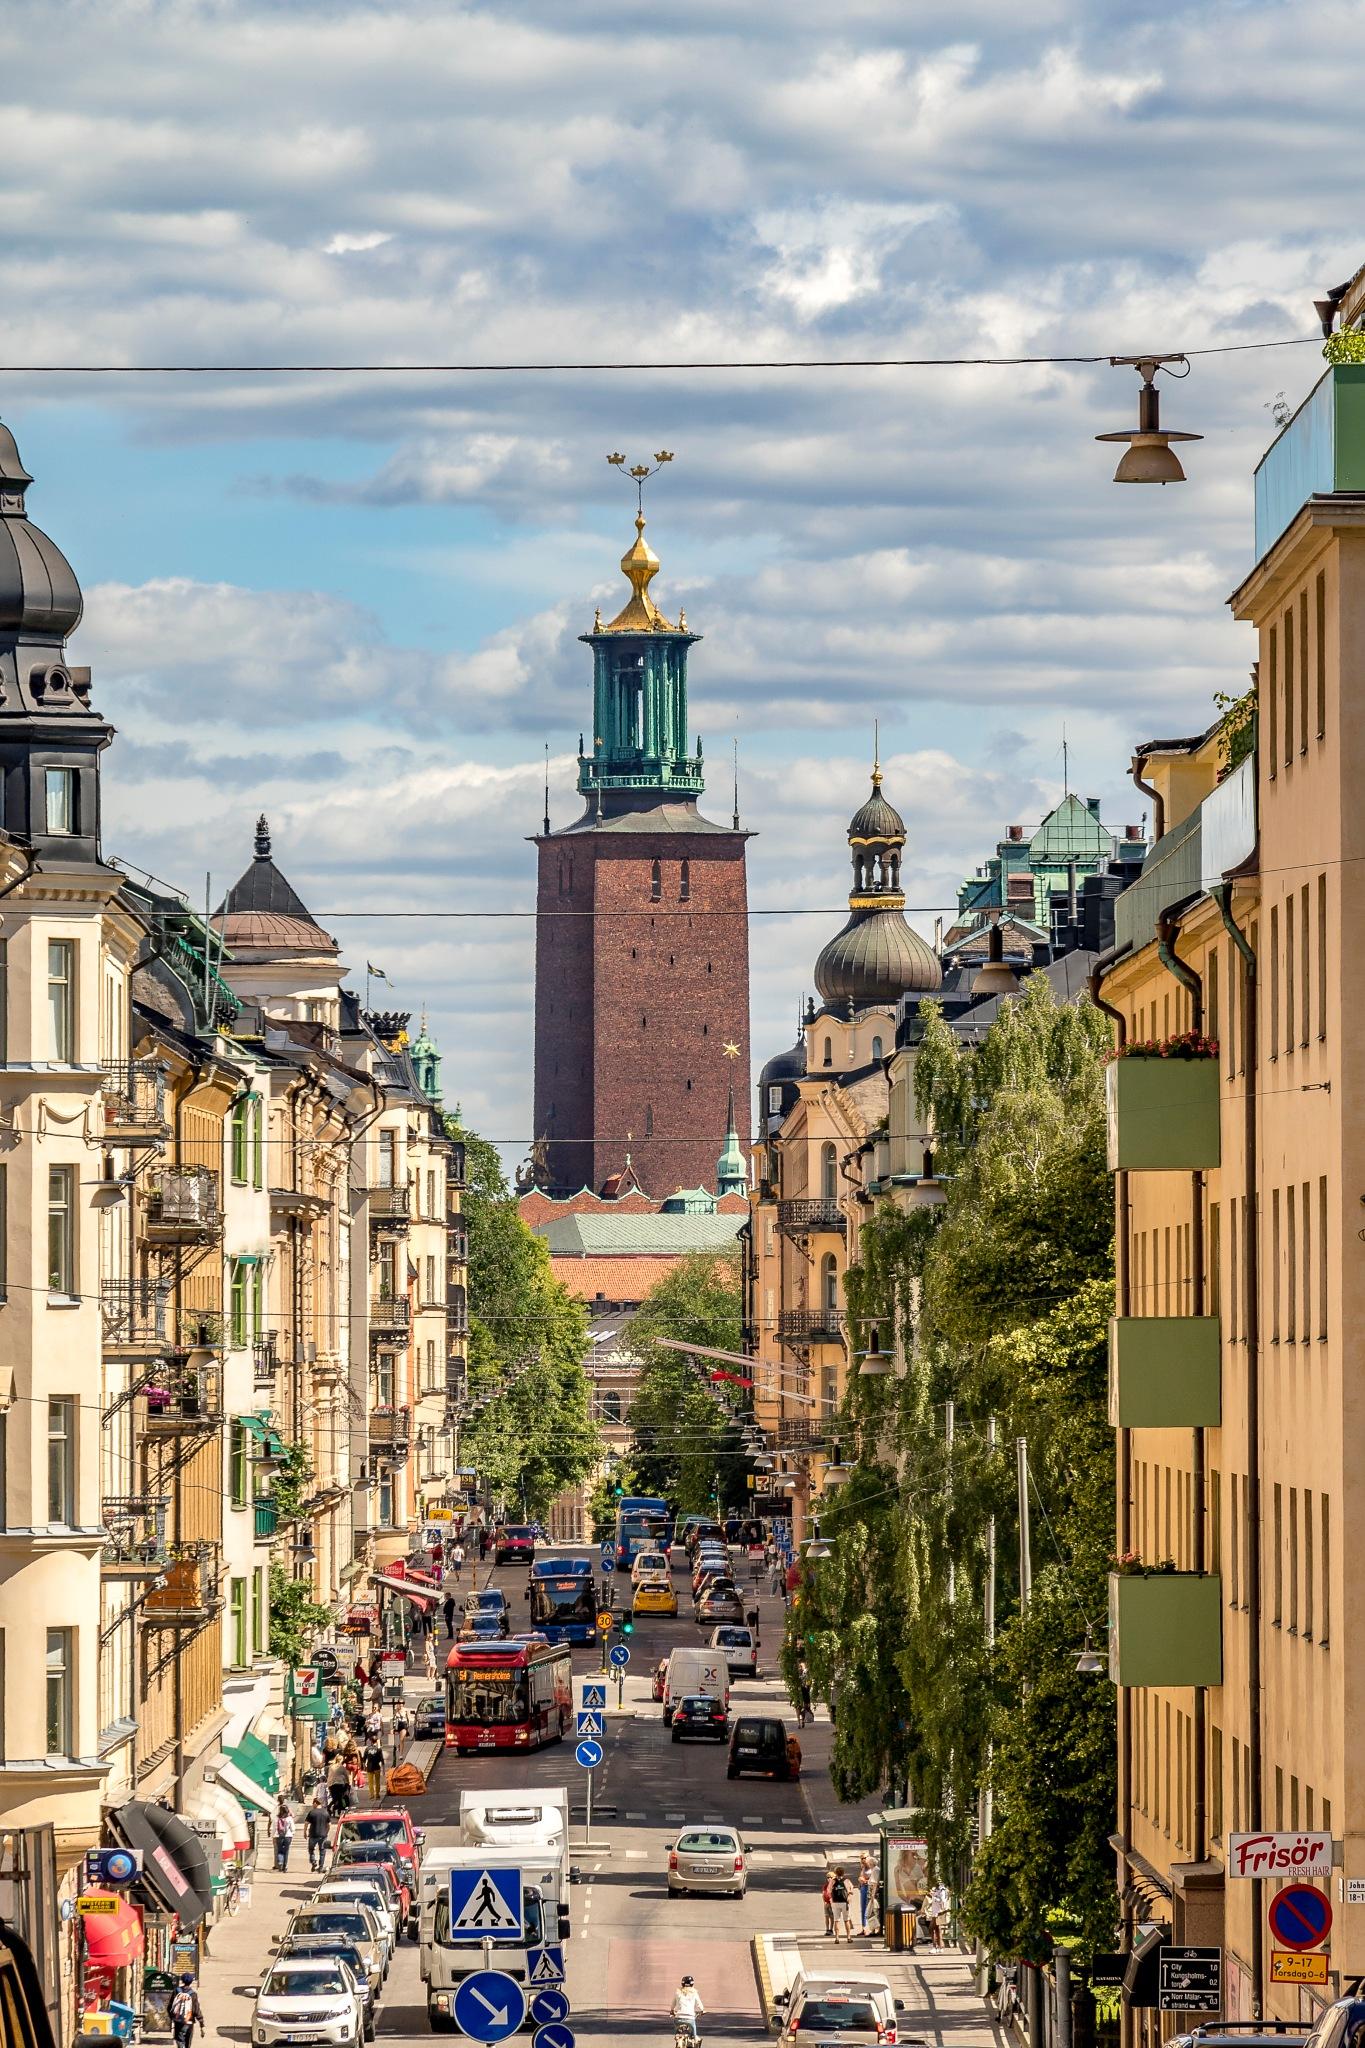 The Stockholm City Hall by Kim Jonsson